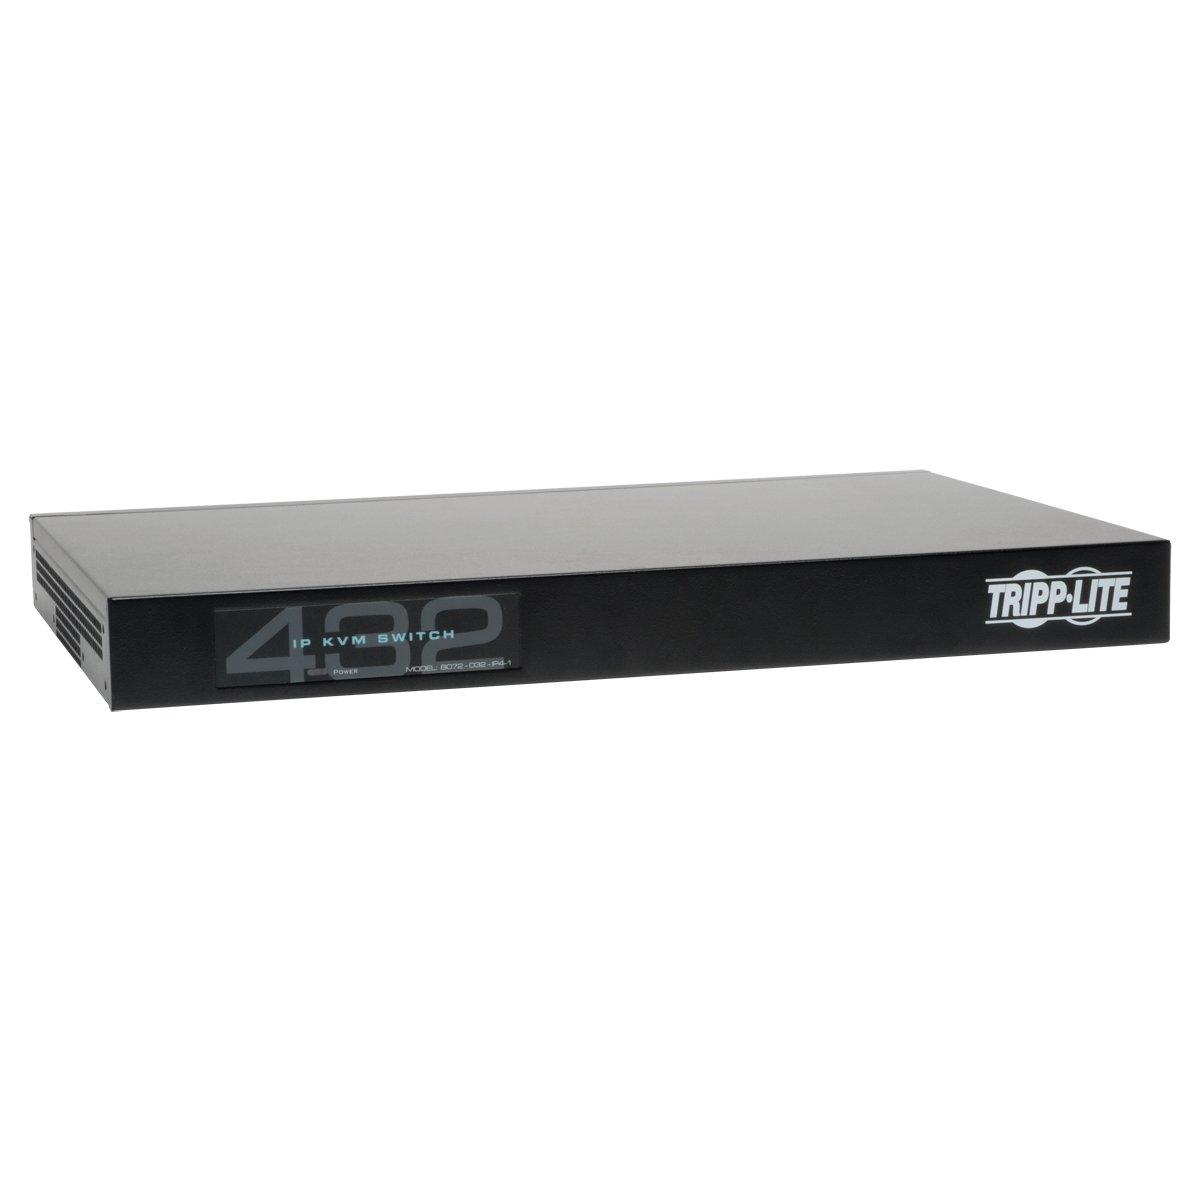 TRIPP LITE 32-Port Cat5 KVM Over IP Switch 1 Local 4 Remote 16 USB Dongles, Black (B072-032-IP4-K) by Tripp Lite (Image #1)